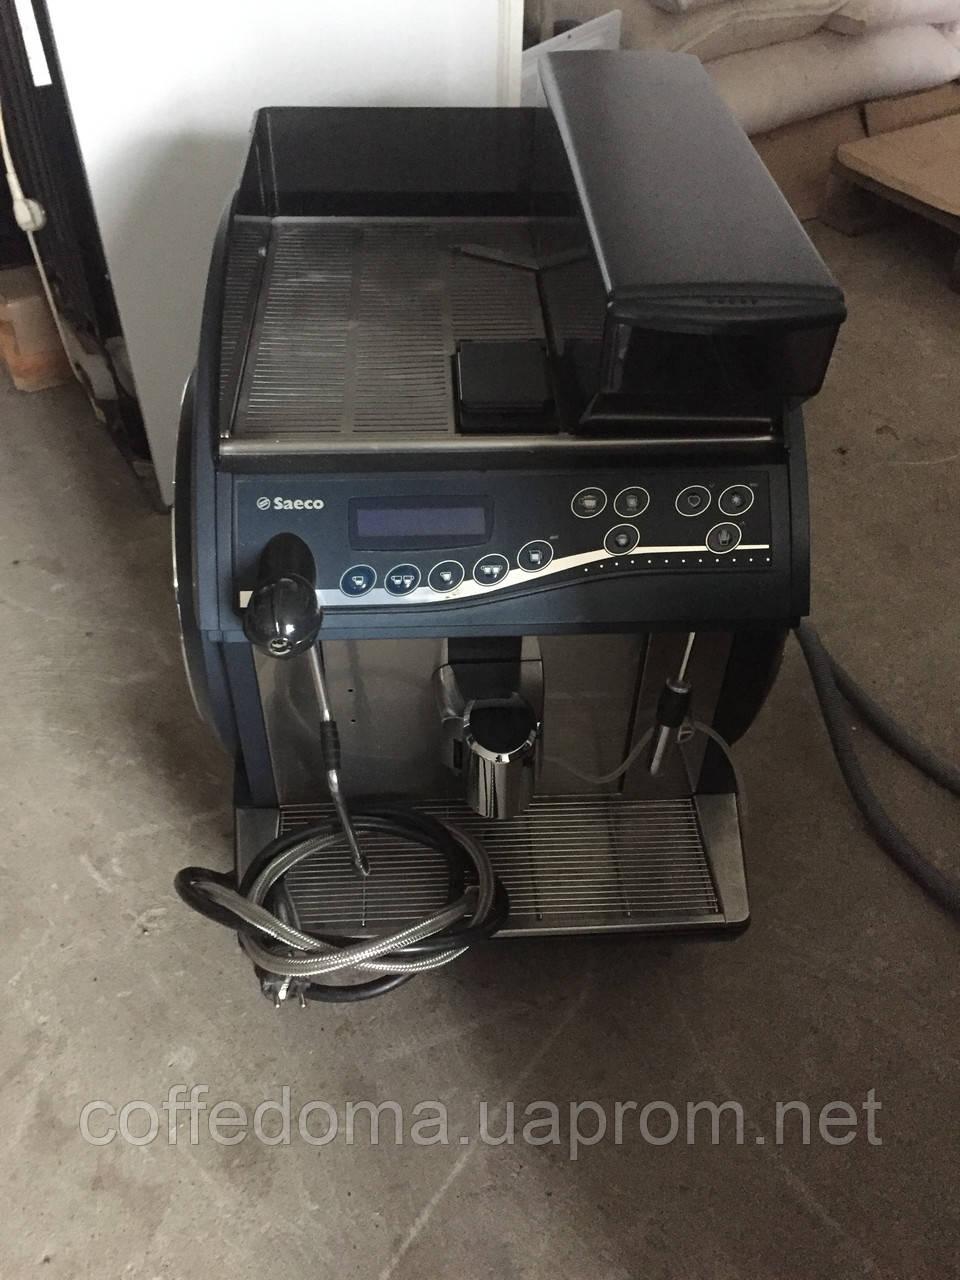 Saeco Idea Cappuccino суперавтомат